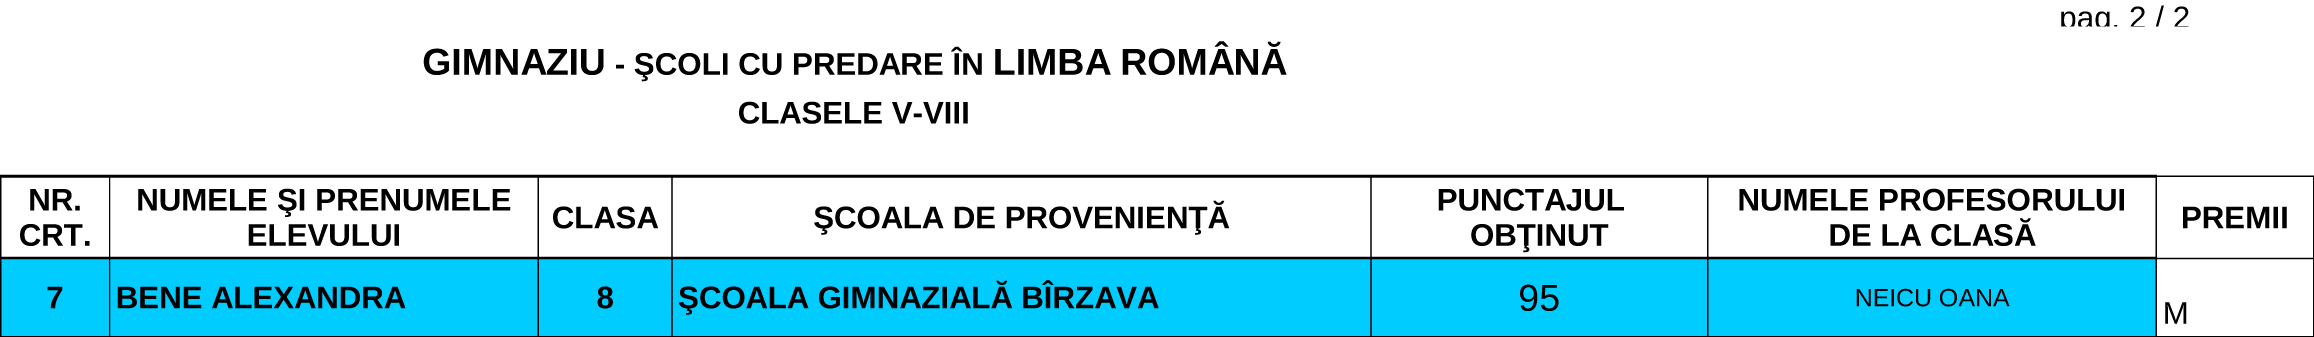 gimnaziu_olimpiada_lromana_2